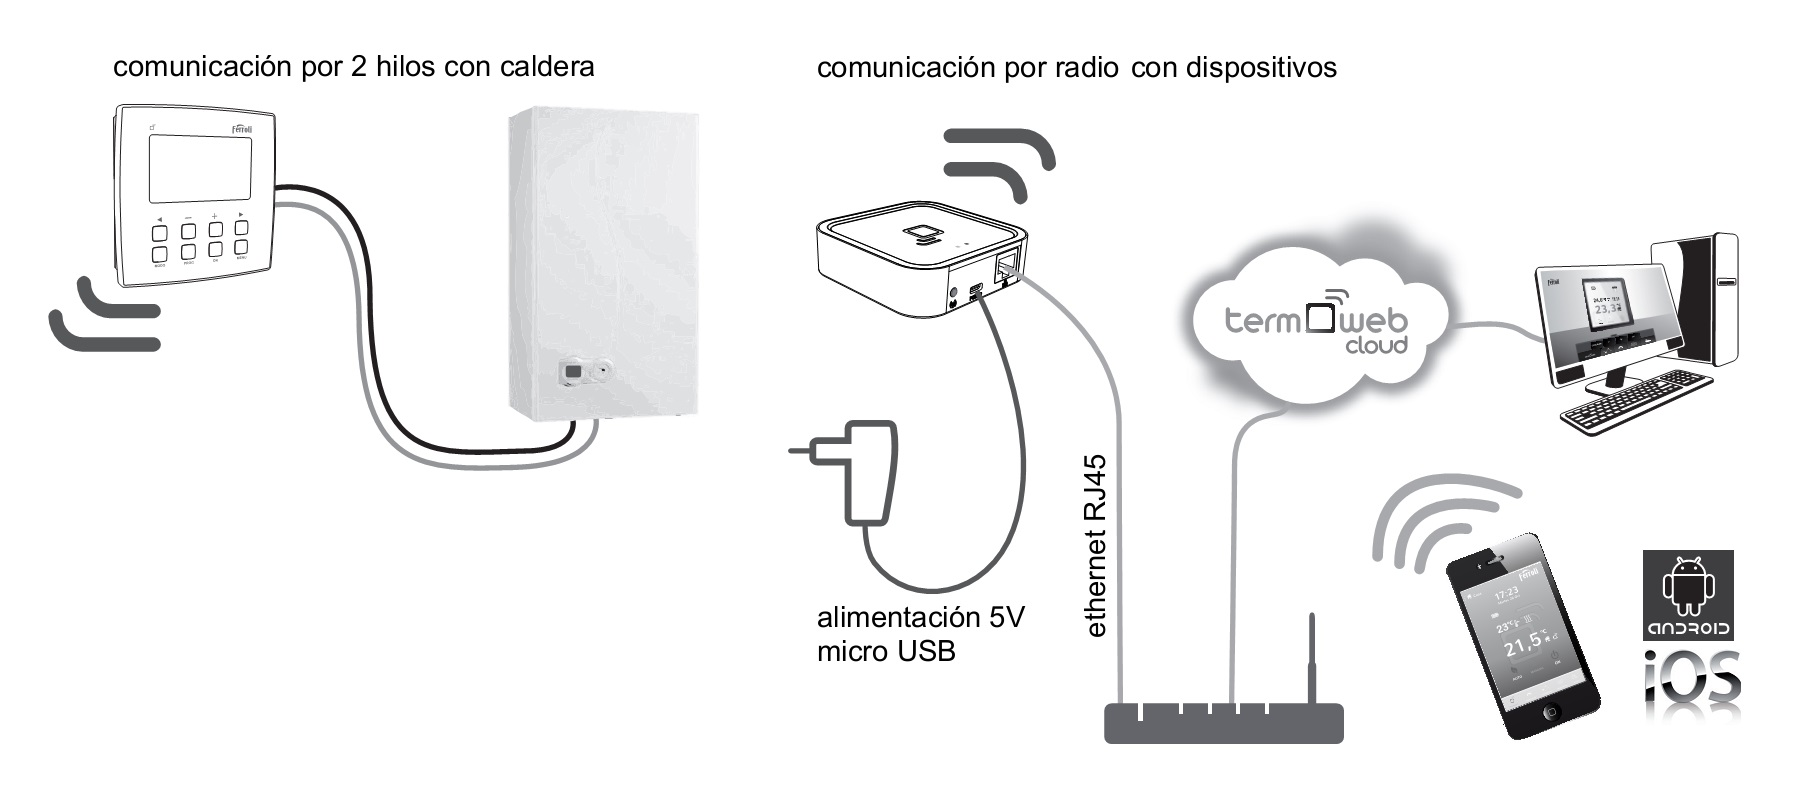 Termostato programador wifi ferroli for Termostato caldera wifi